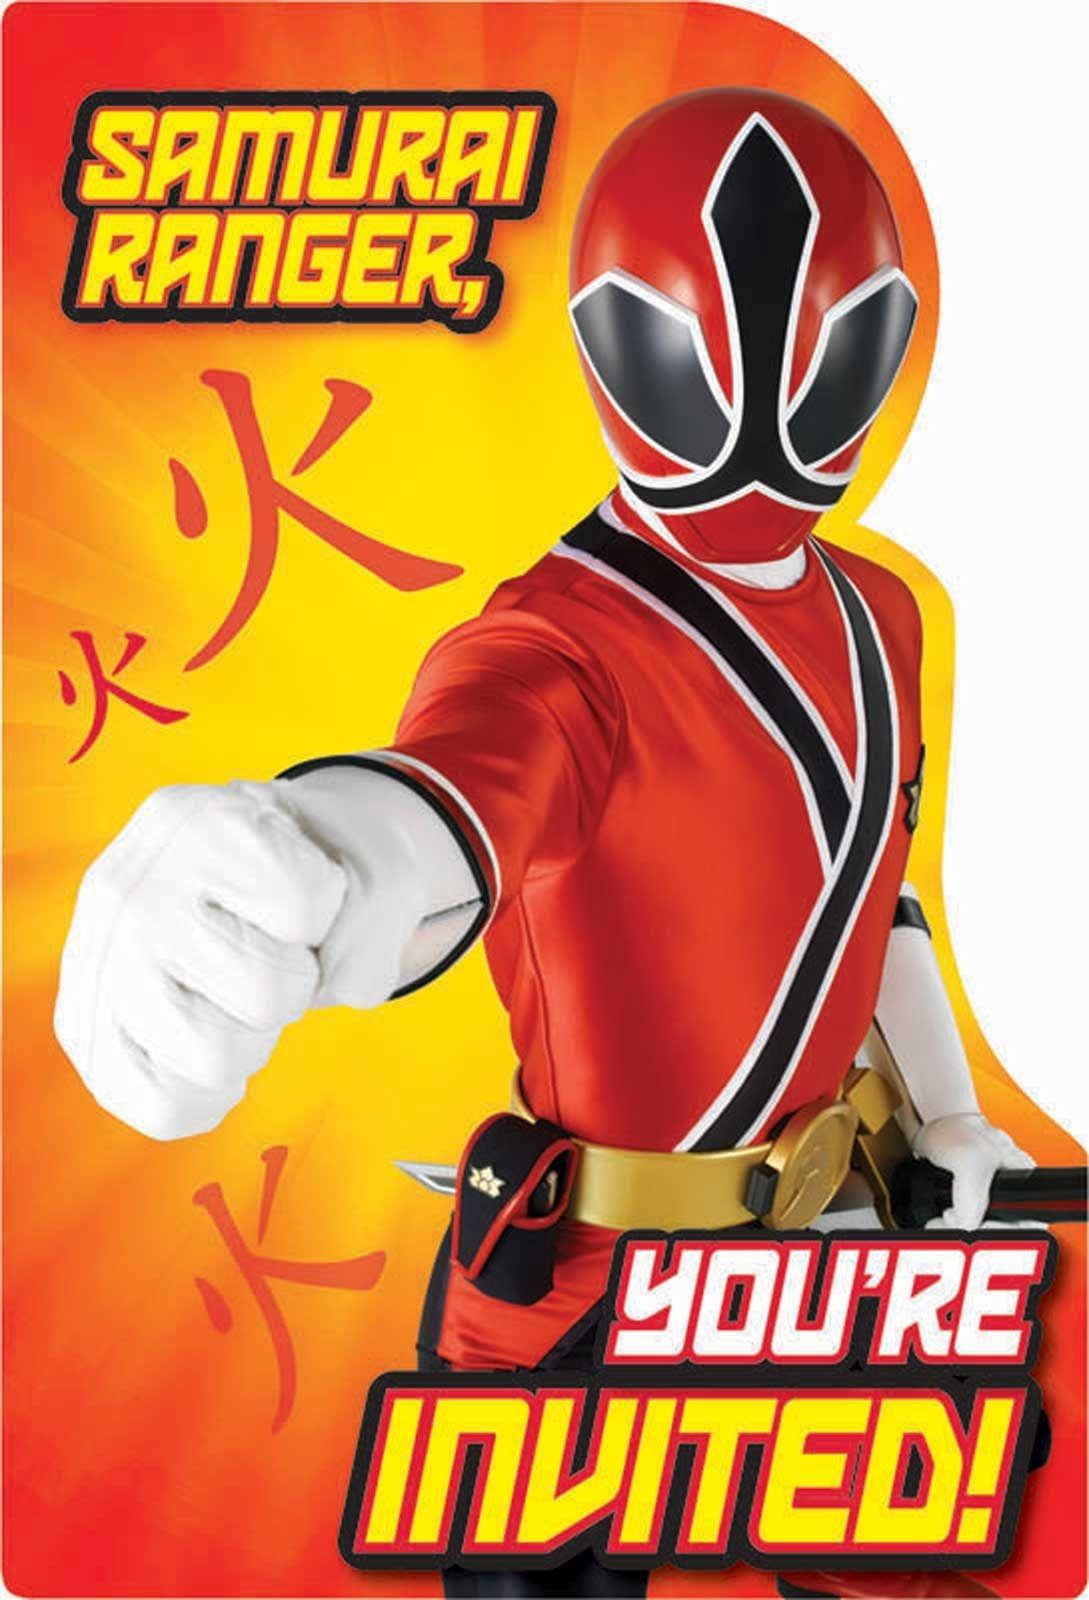 Free Power Ranger Birthday Invitations | Bagvania Invitation In 2019 - Free Printable Power Ranger Birthday Invitations